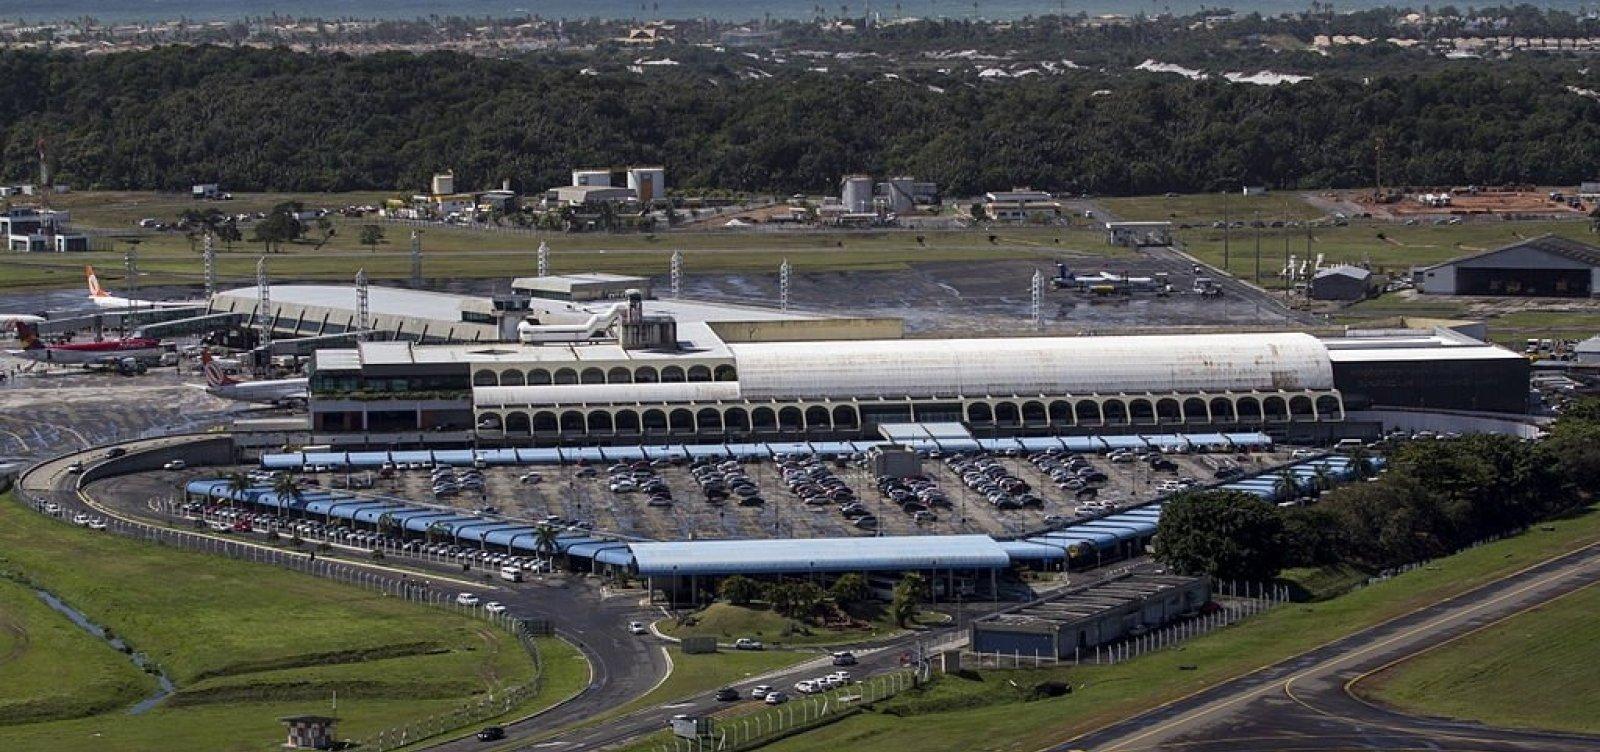 [Pista principal do Aeroporto de Salvador segue fechada hoje]